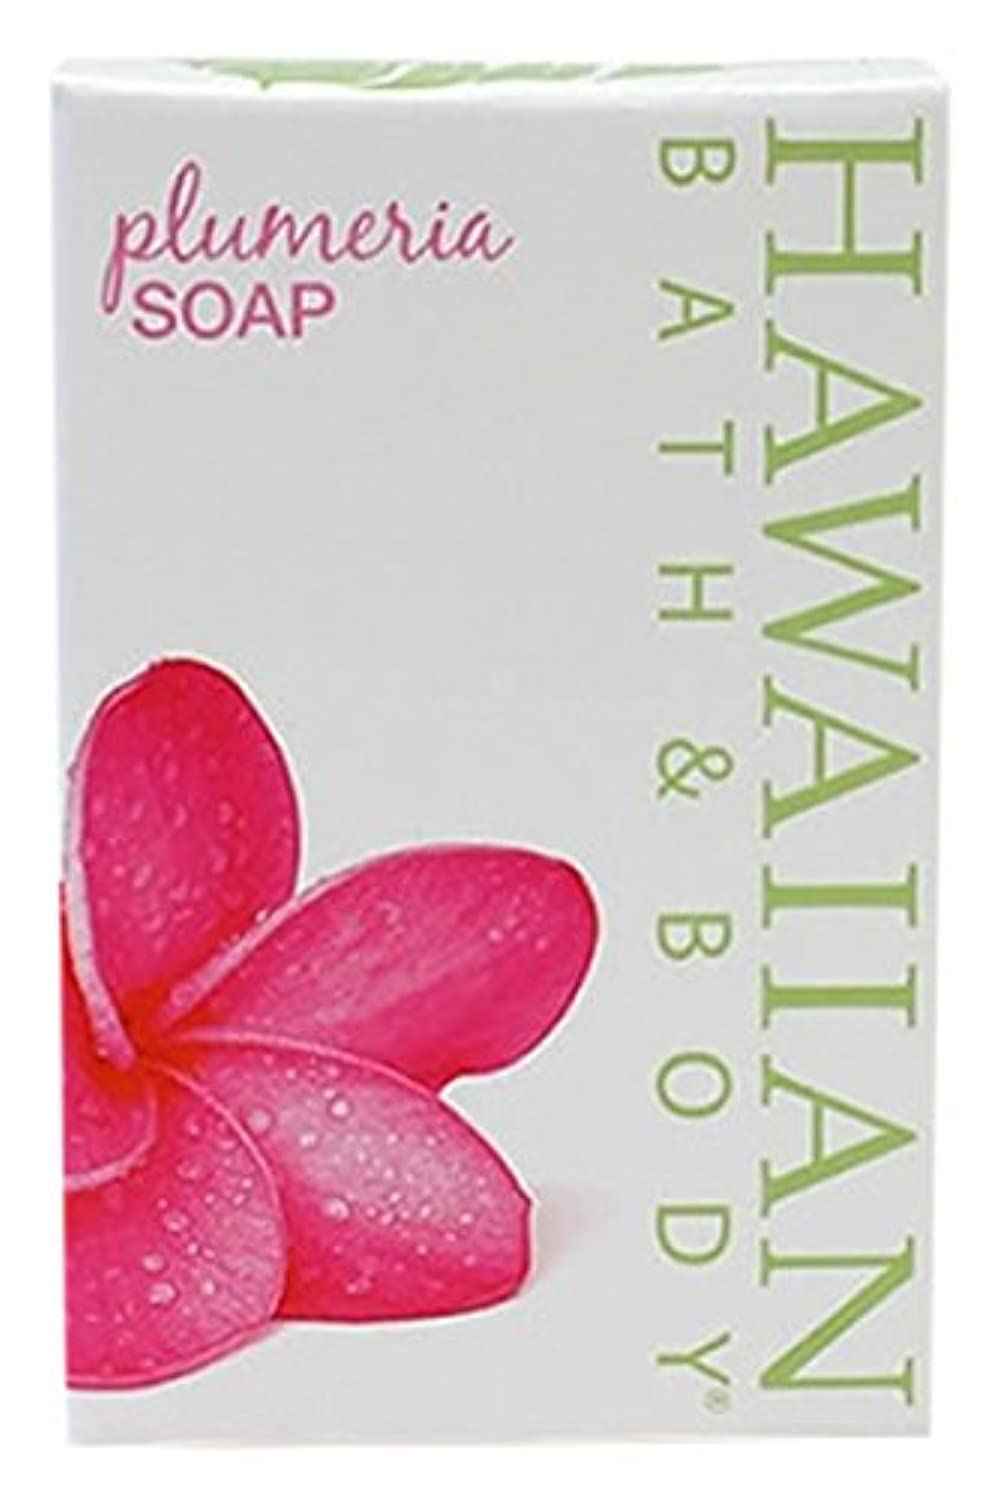 HAWAIIAN BATH & BODY SOAP プルメリア